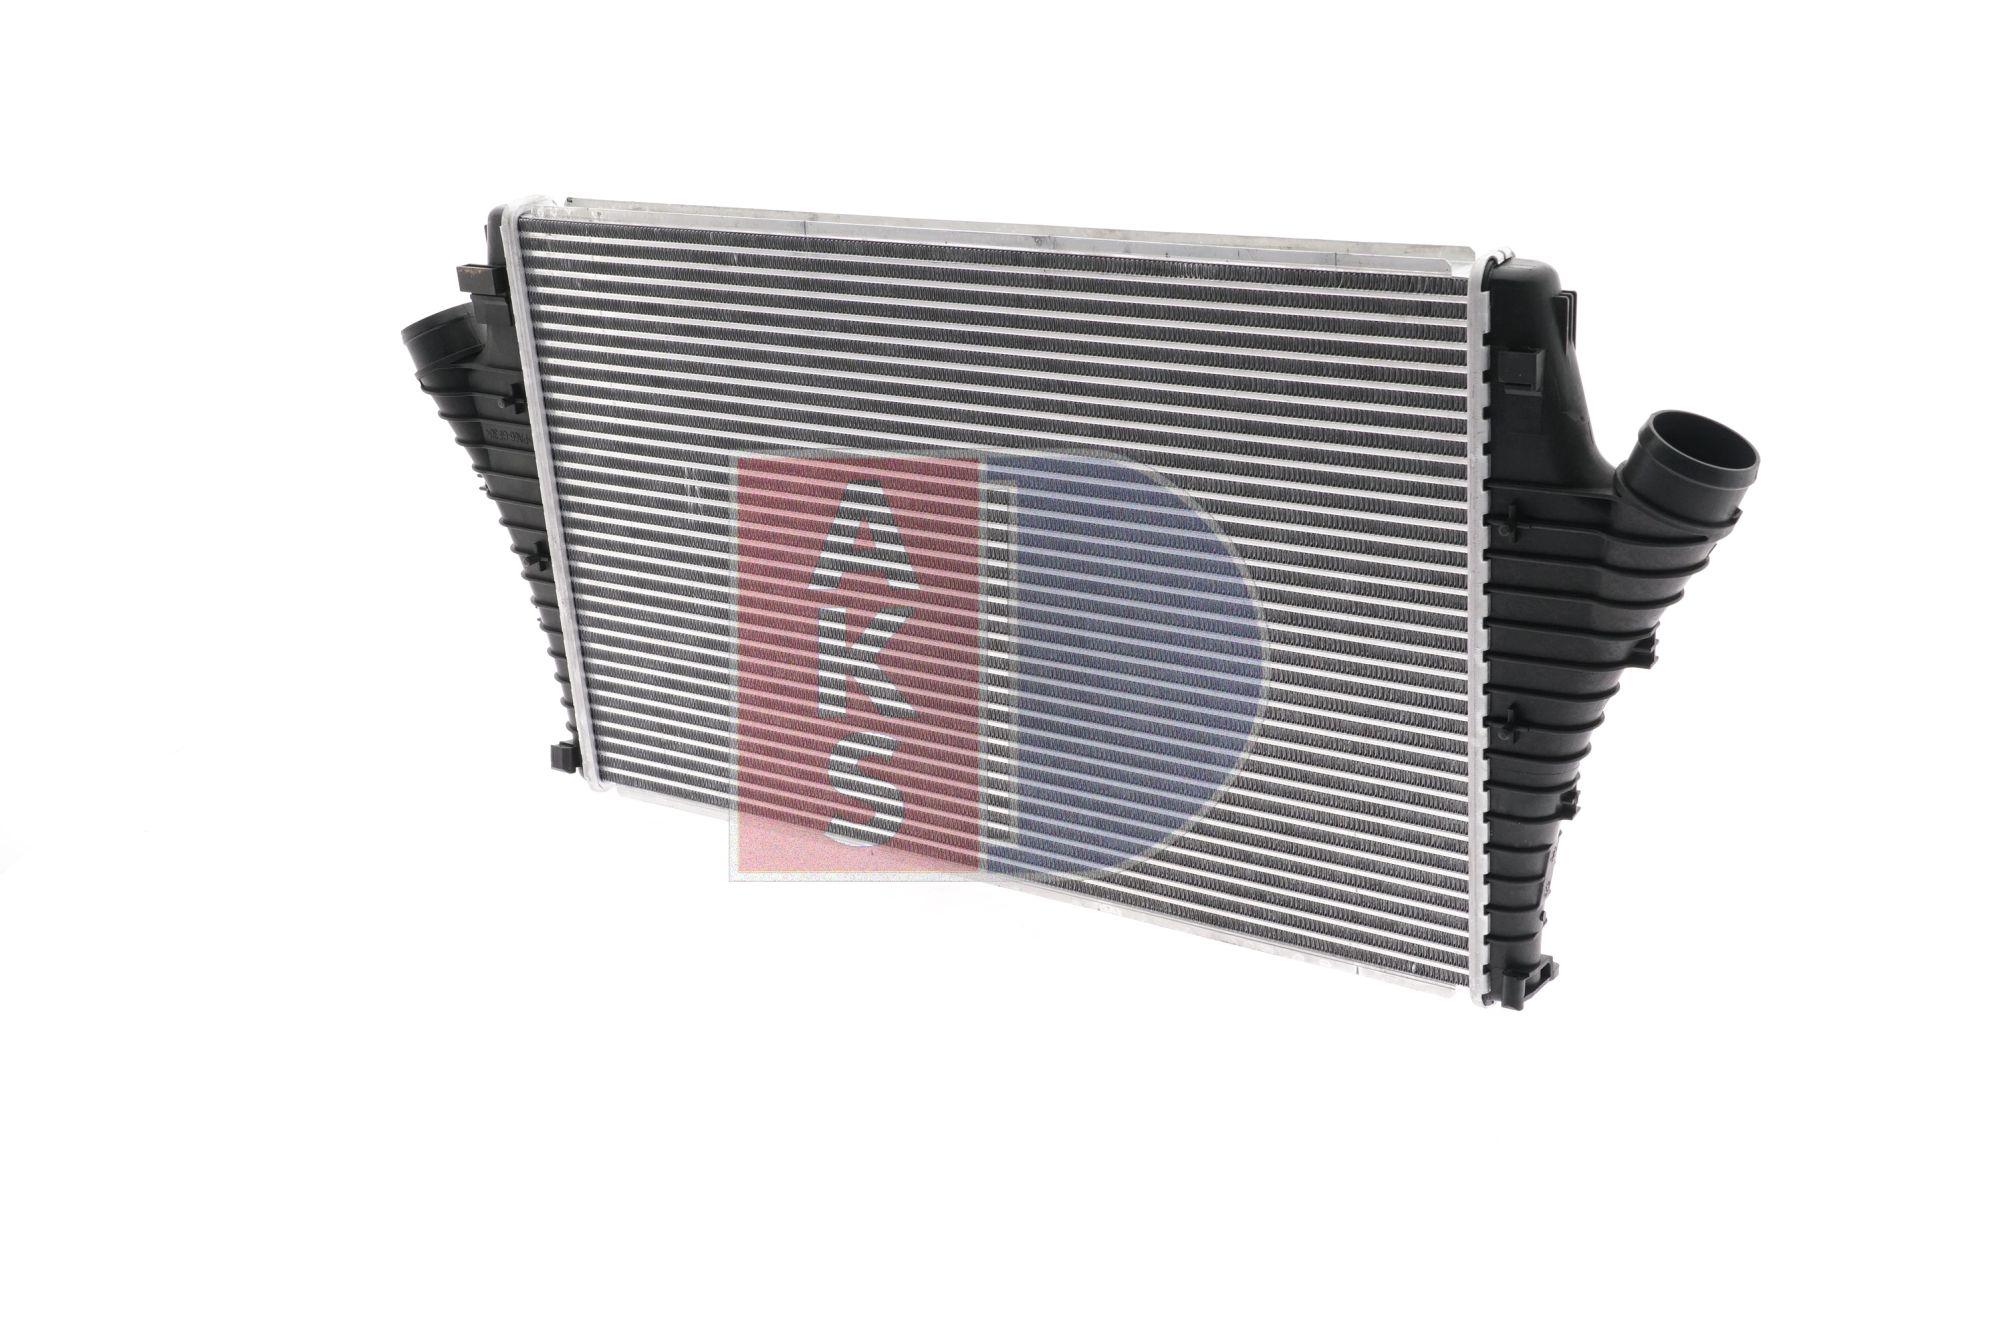 AKS DASIS Radiatore intercooler SAAB Dim. rete rad.: 647x400x29